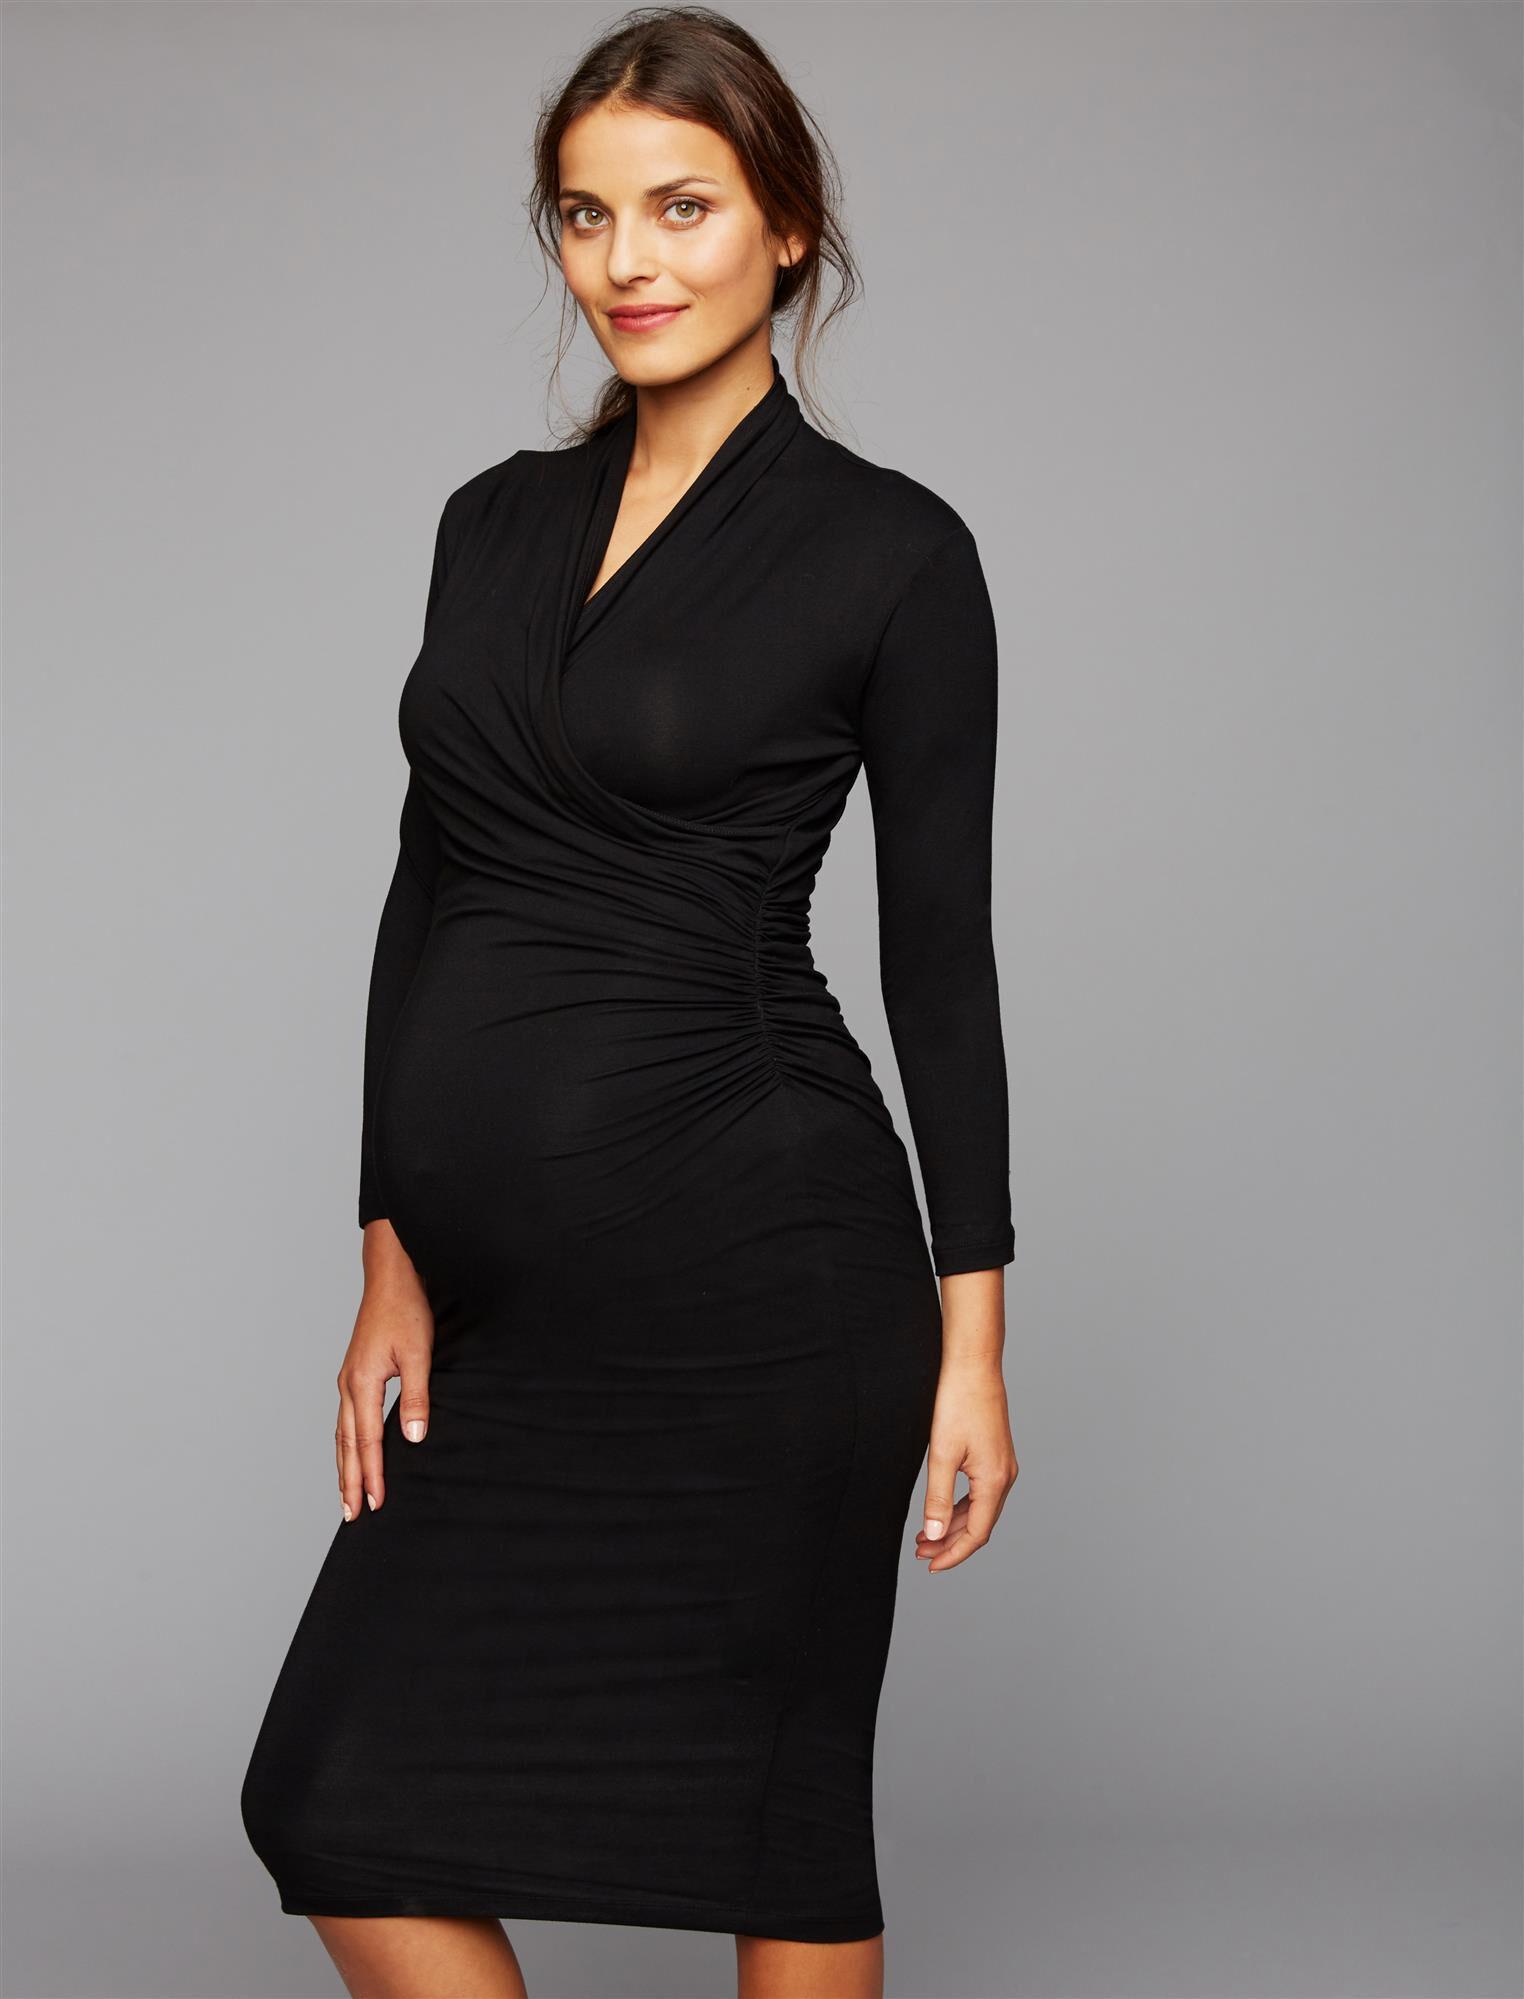 Isabella Oliver Balcome Maternity Dress- Black